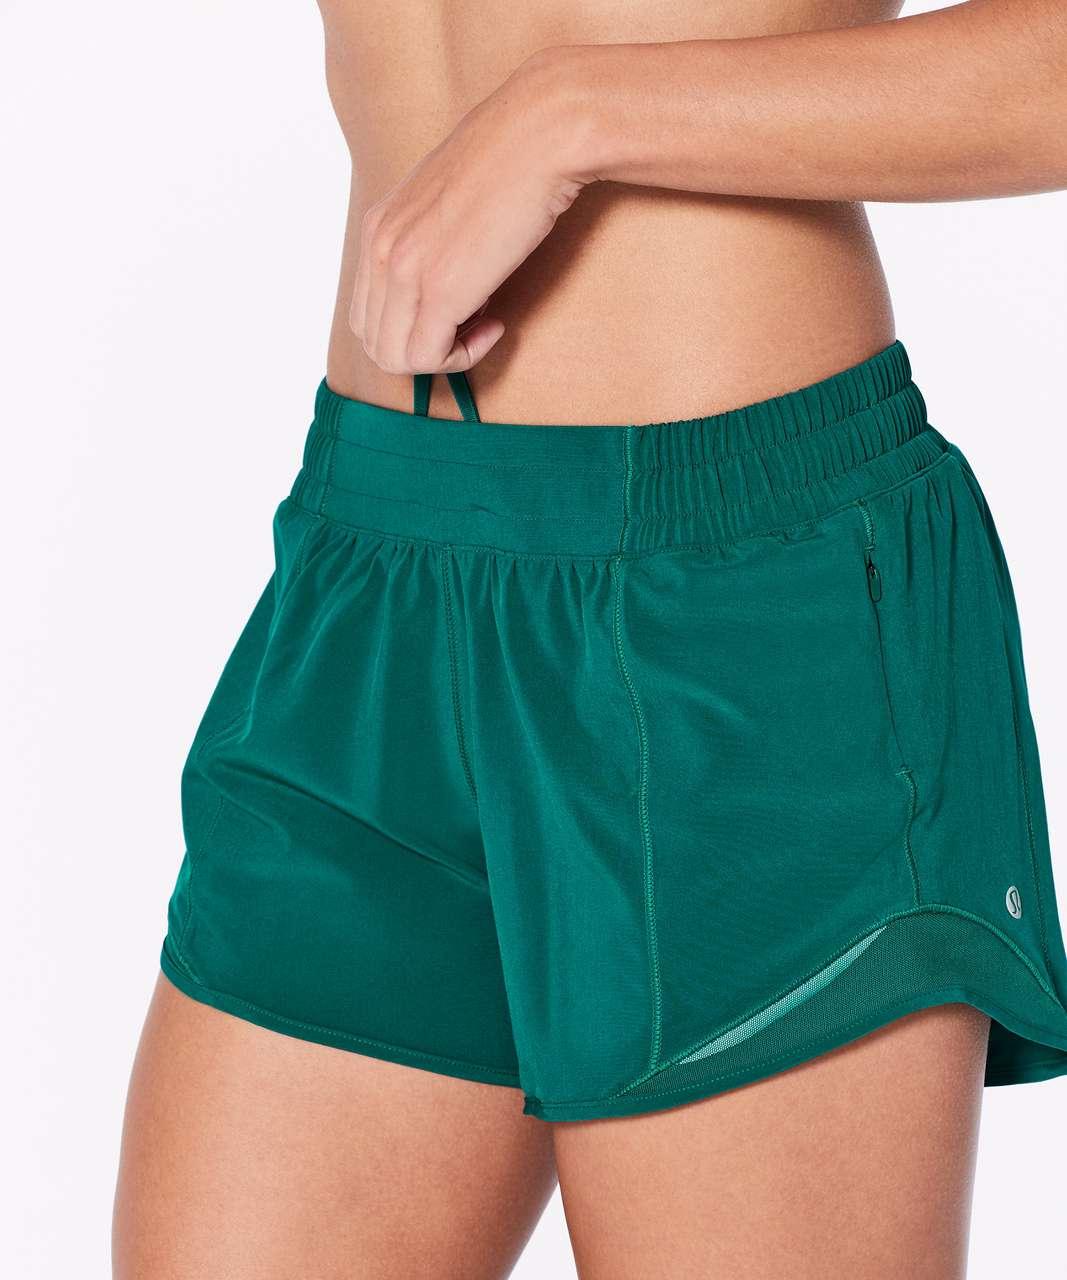 "Lululemon Hotty Hot Short II (Long 4"") - Teal Green"